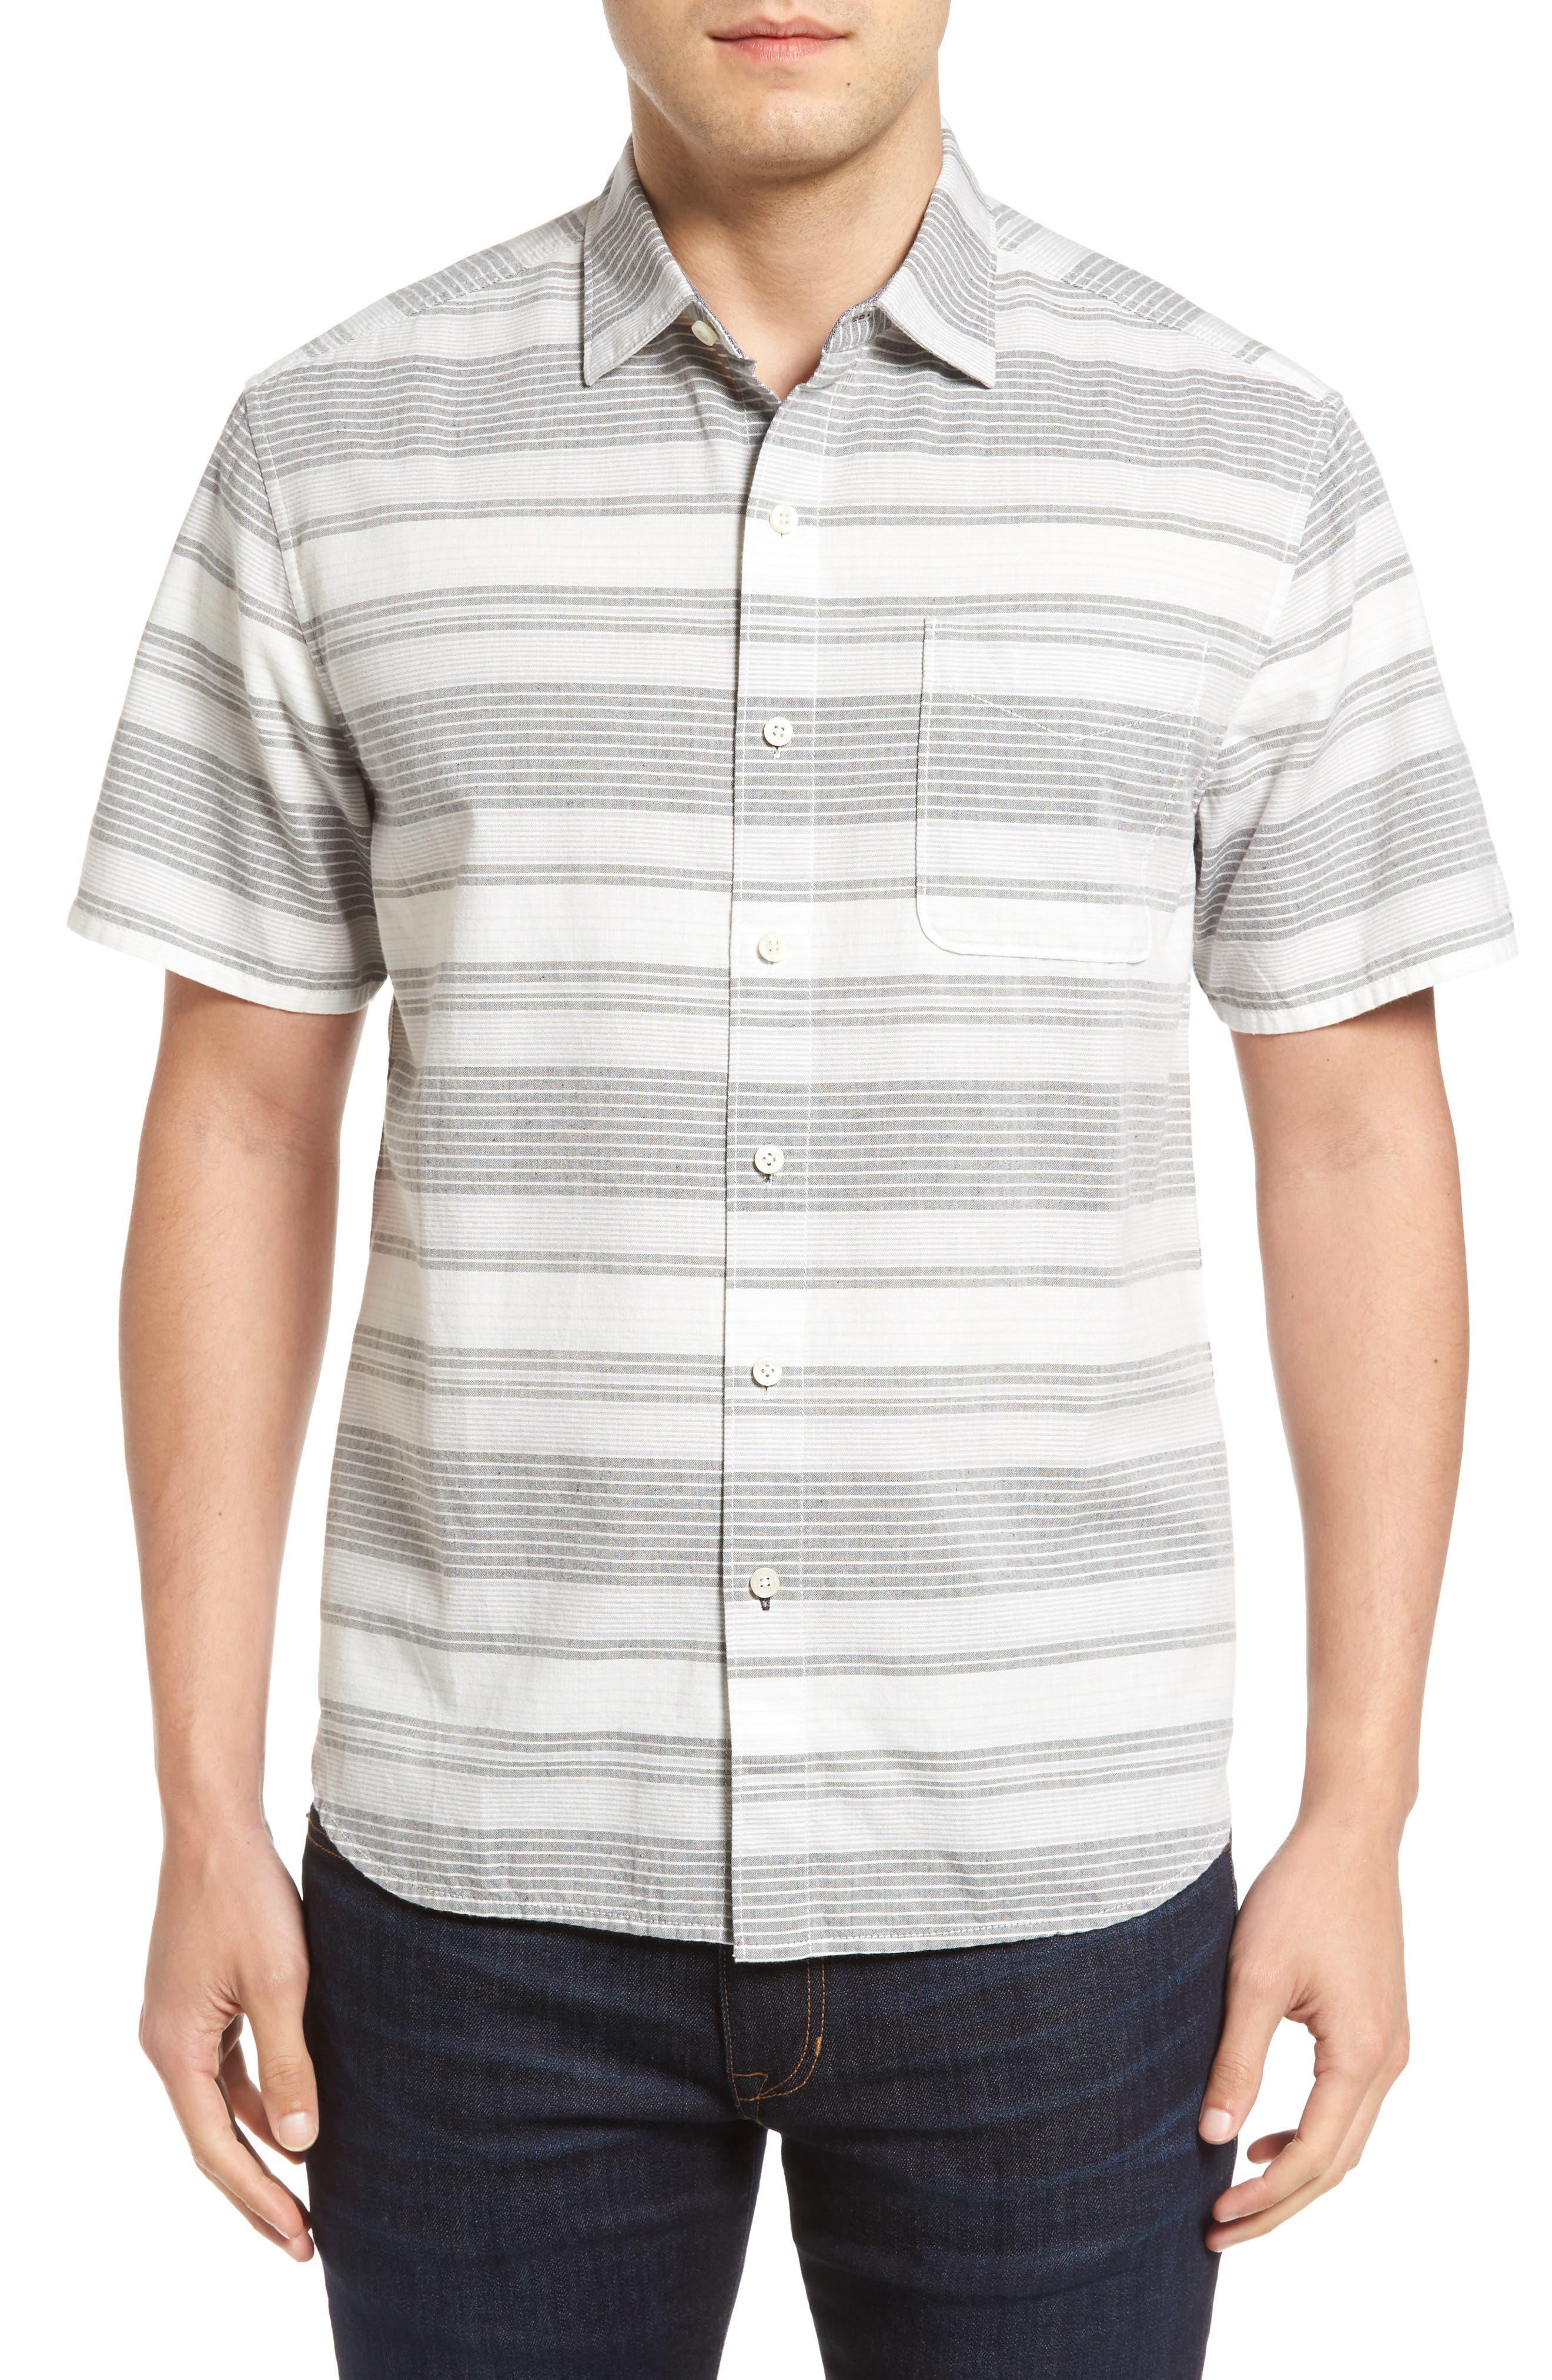 Main Image - Tommy Bahama Clambake Stripe Standard Fit Sport Shirt